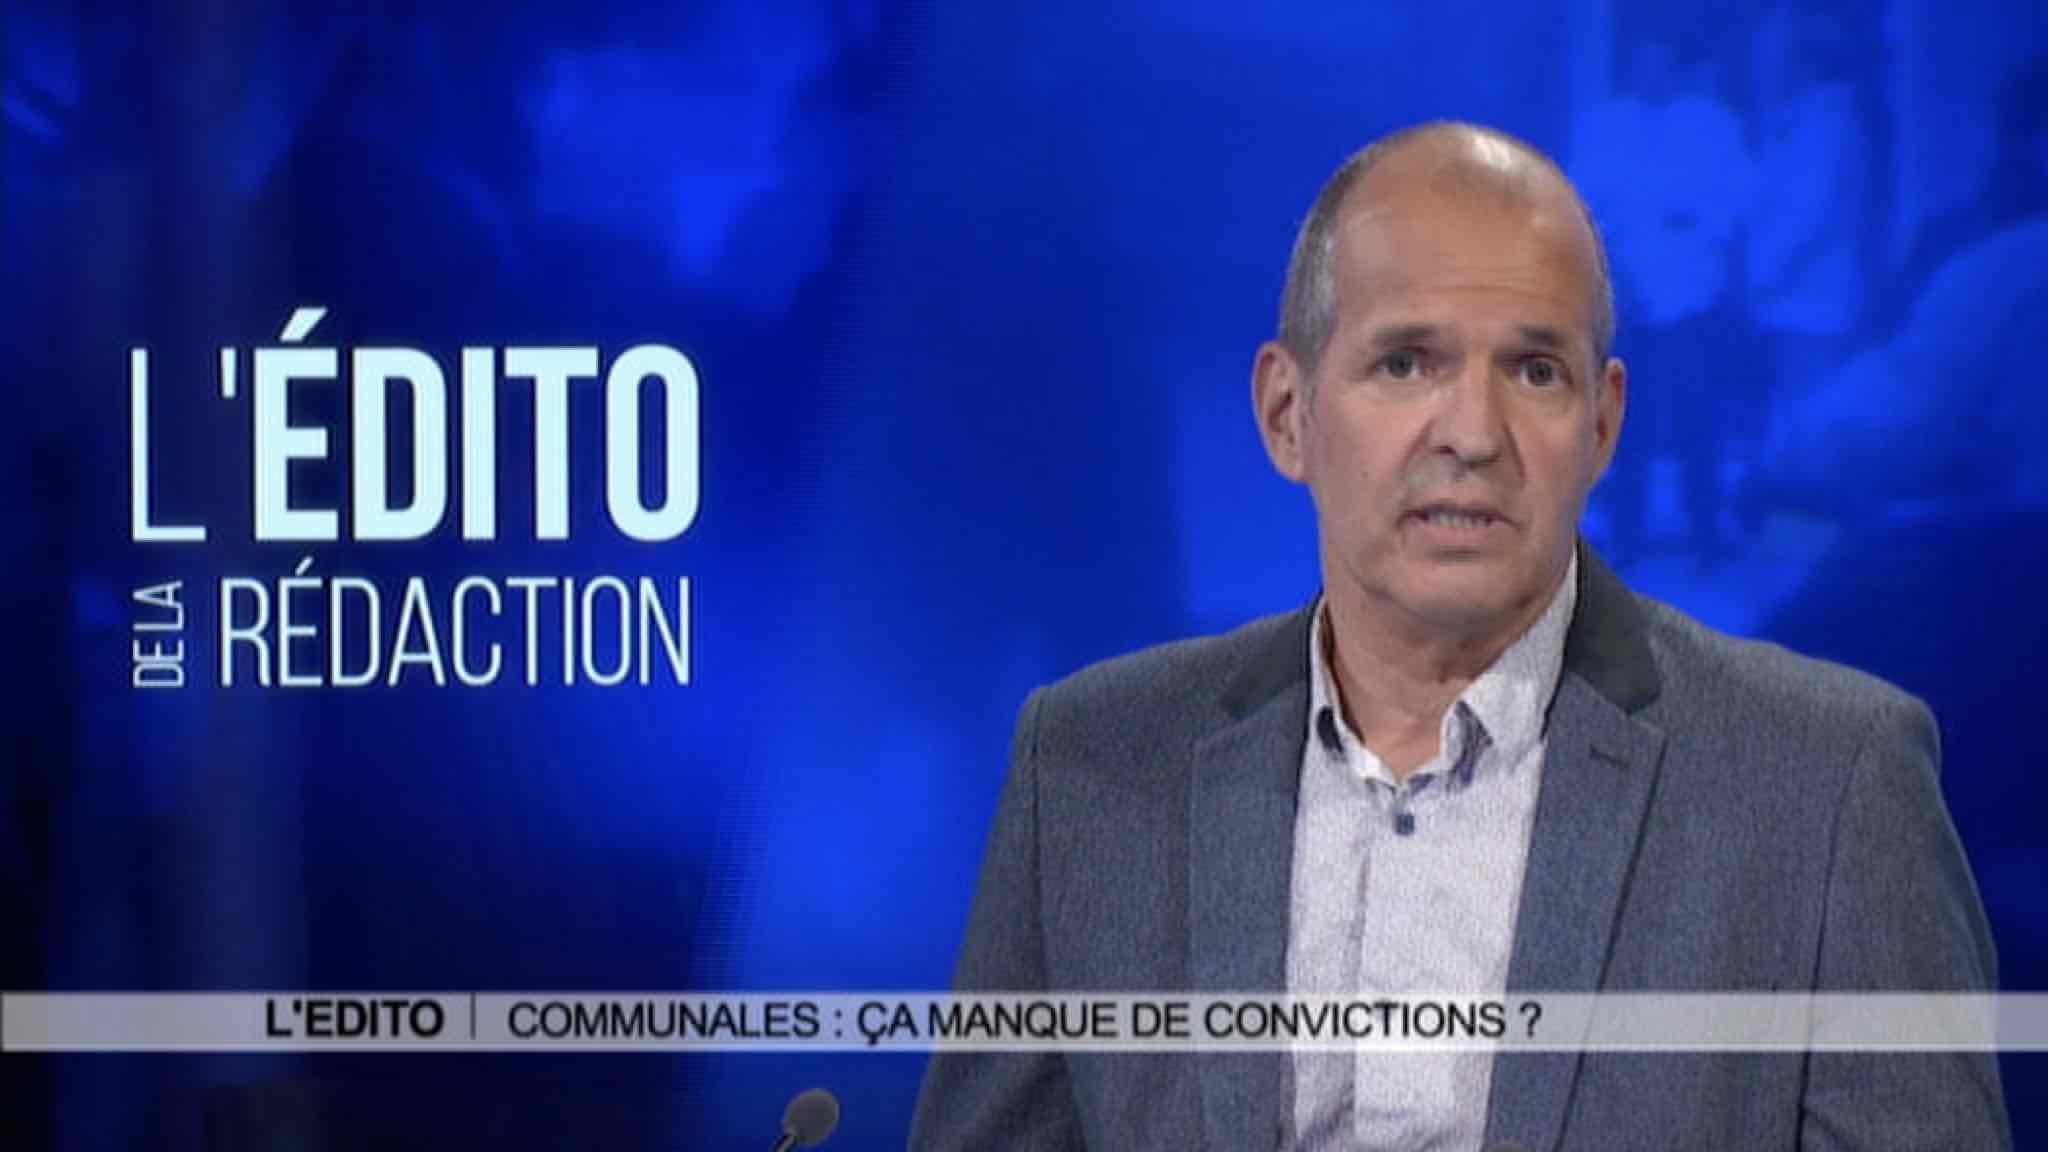 Edito: élections communales, ça manque de convictions?